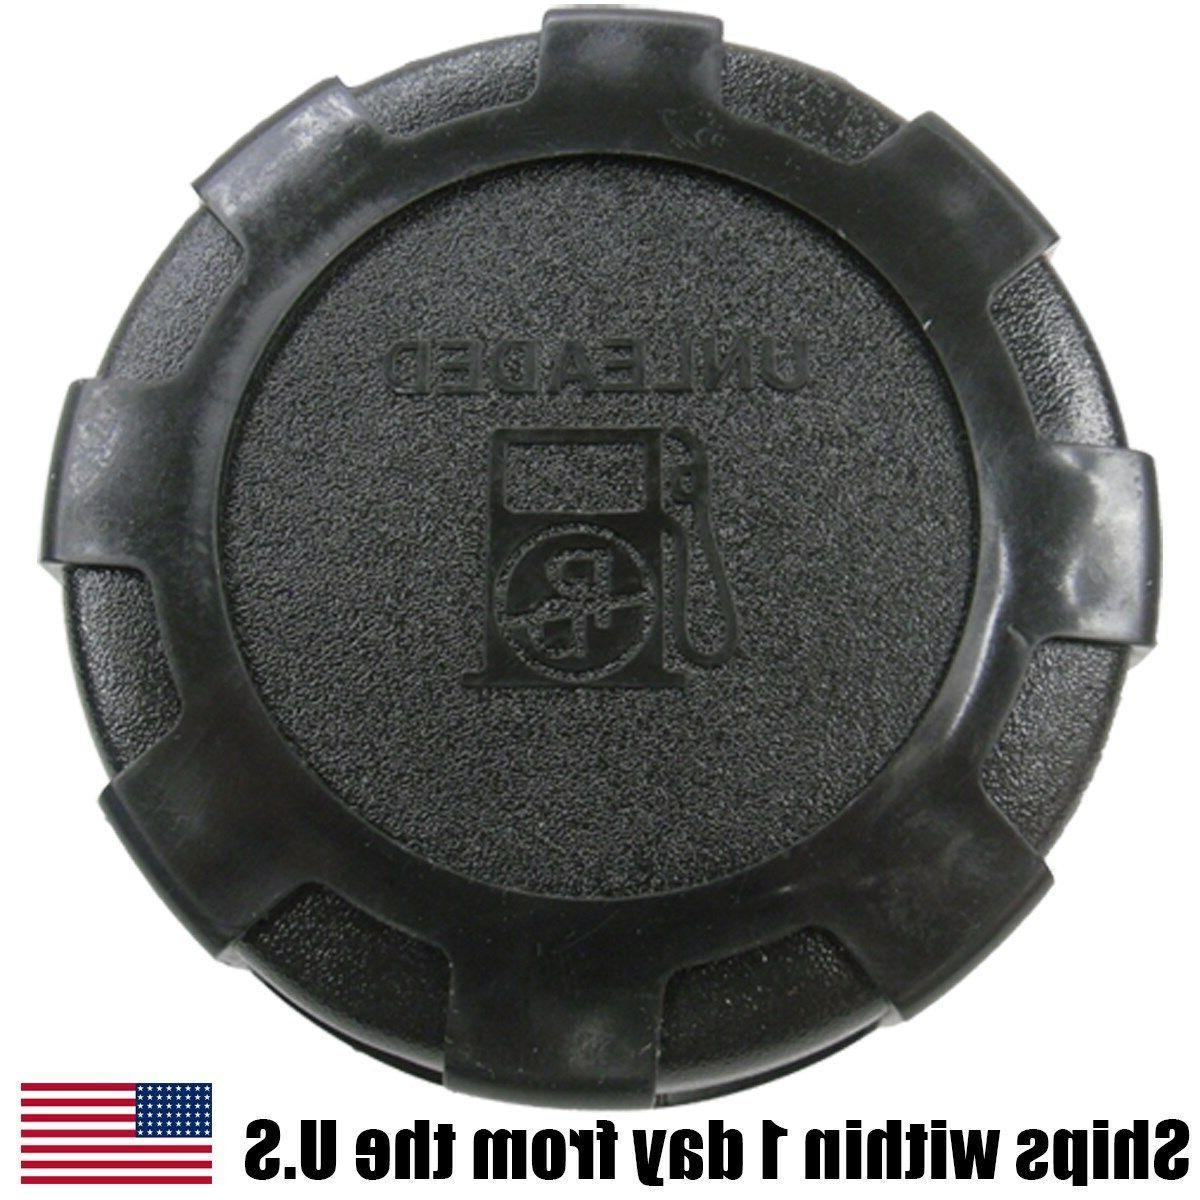 Toro Lawn Mower Fuel Gas Cap 88-3980 Commercial Z-Master Tim